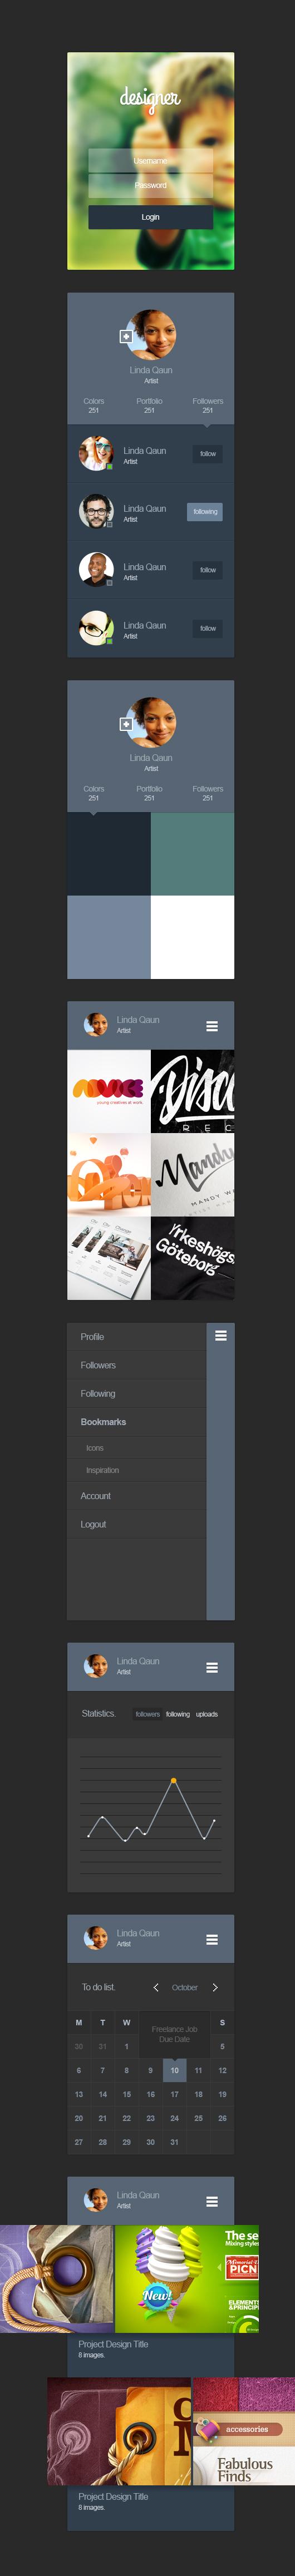 Portfolio App Design Ui Kit Psd